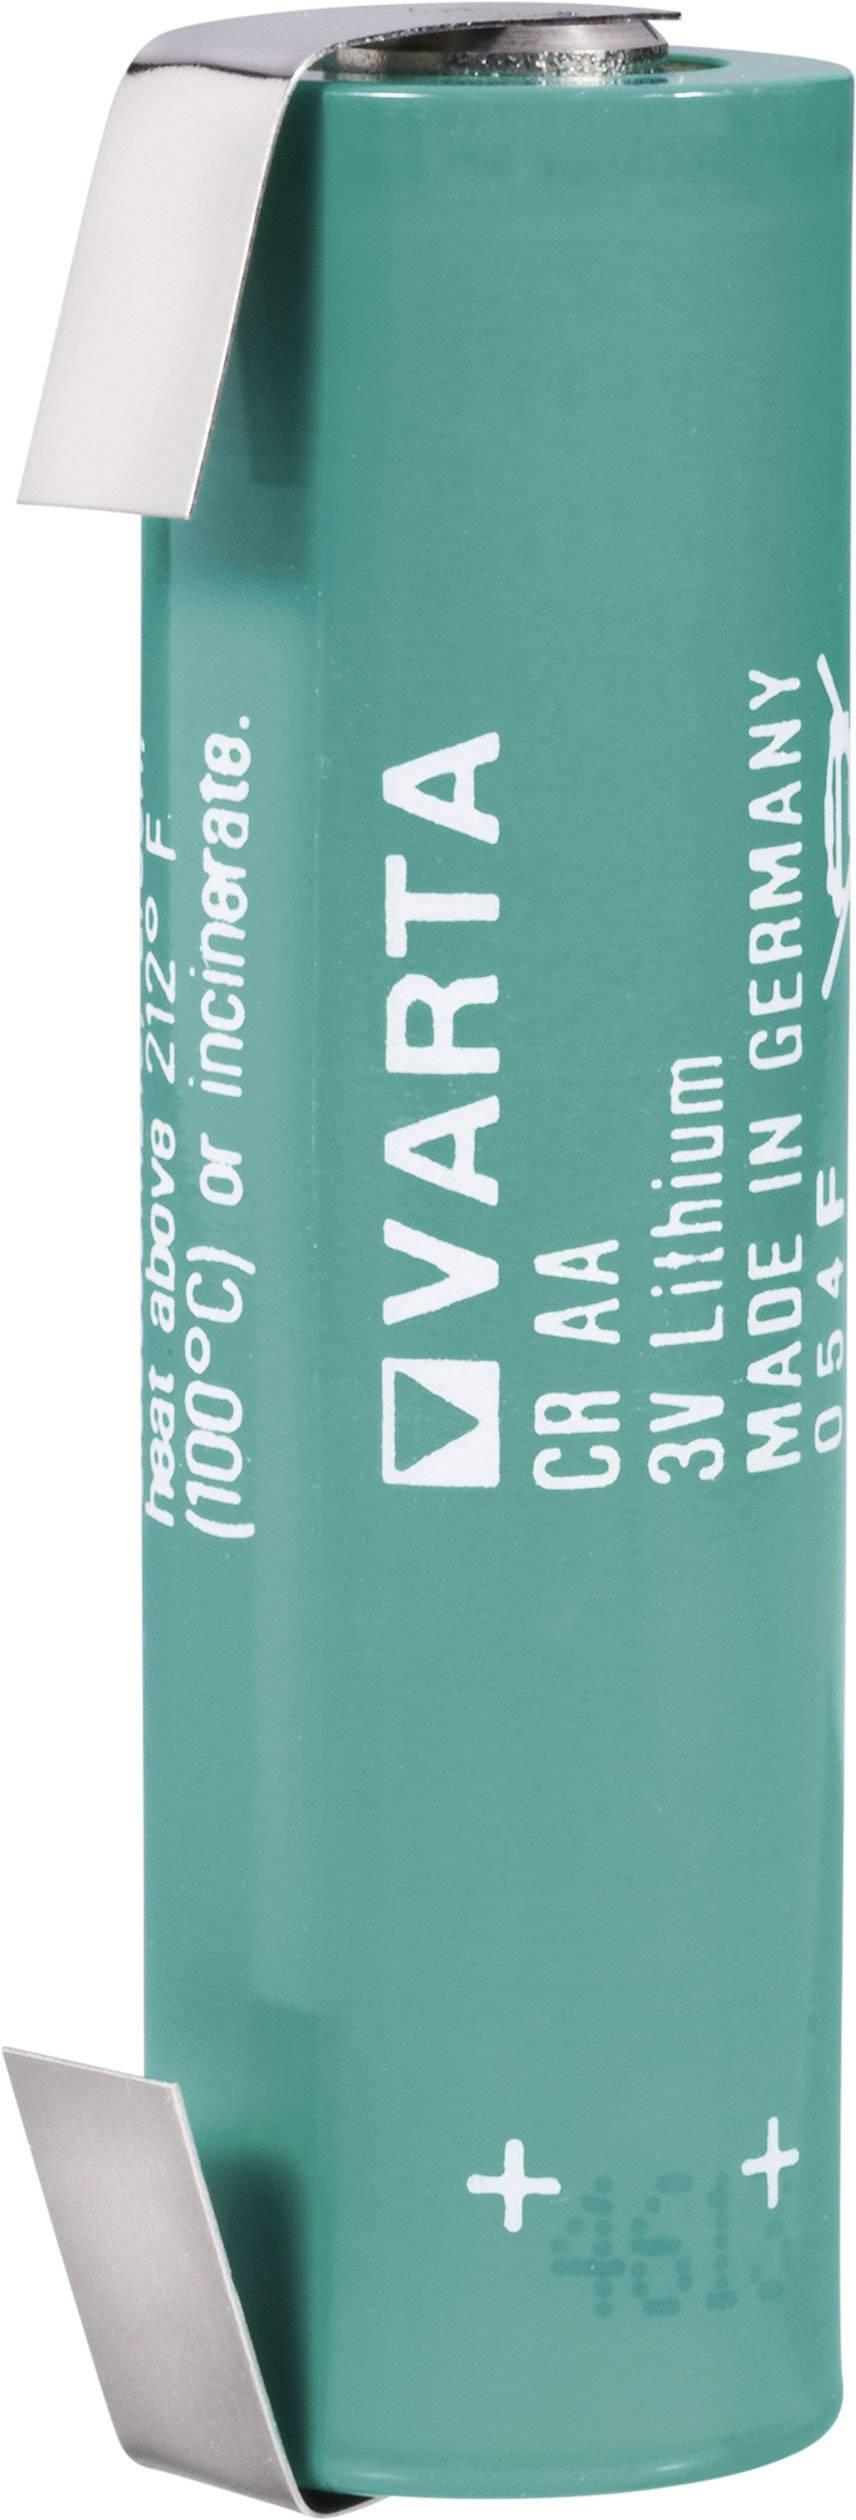 Špeciálny typ batérie CR AA LF lítium, Varta CR AA LF, 2000 mAh, 3 V, 1 ks